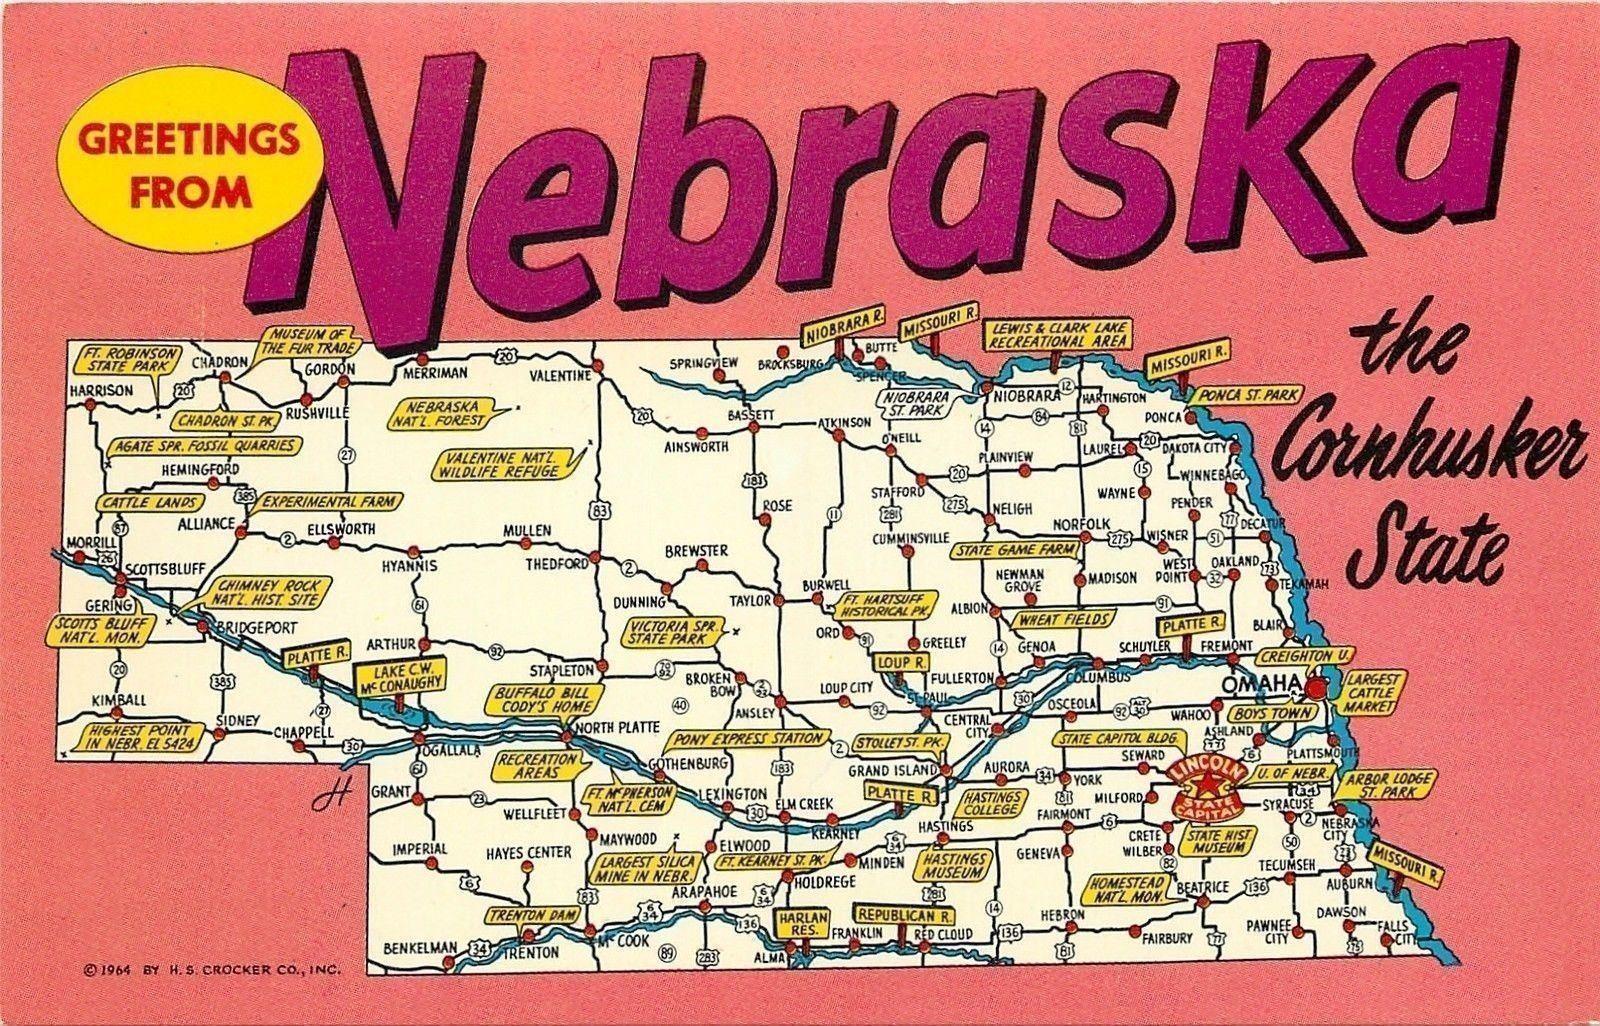 Imperial Nebraska Map.Nebraska Map Morrell To Syracuse Ponca To Imperial Miden To Mullen